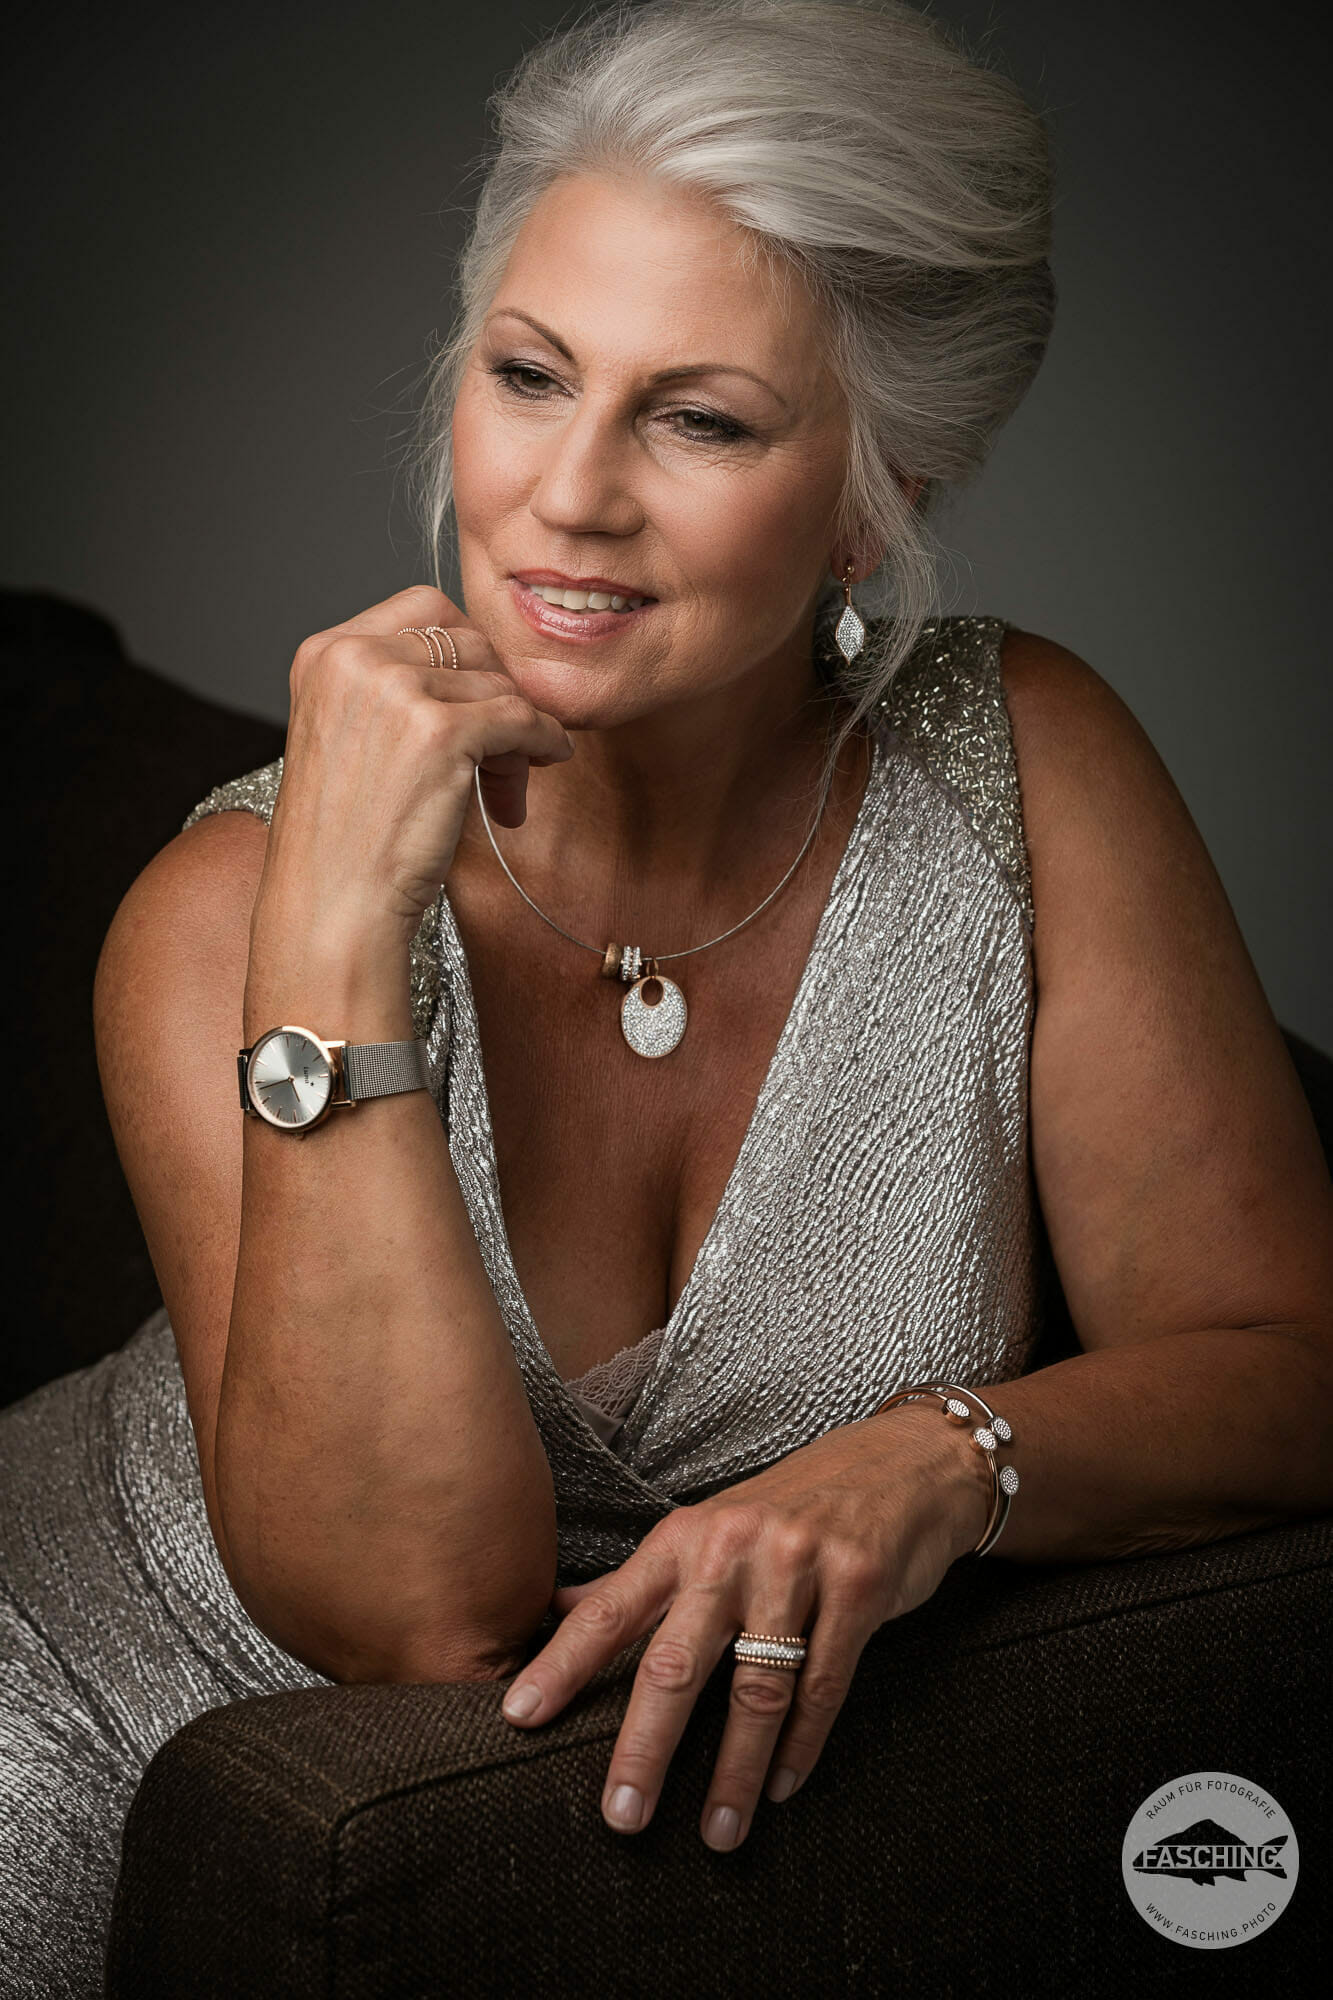 Lady with Jewellery, photo by Studio Fasching, Austria